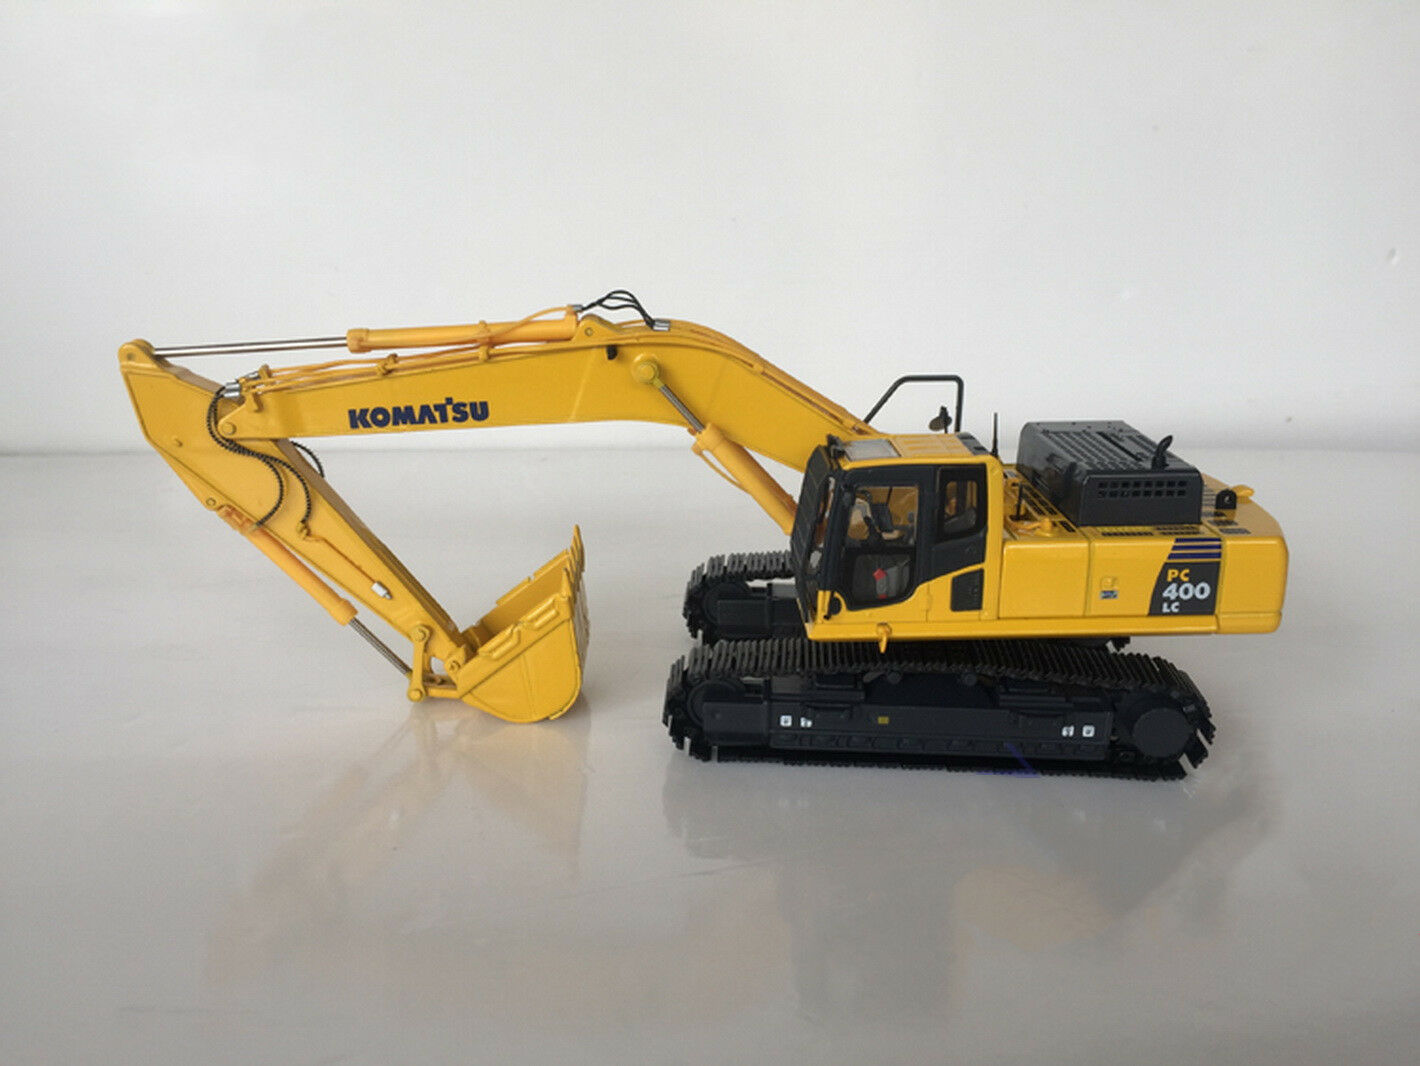 1 50 pistas de metal Excavadora Komatsu PC400LC-8 Juguete Diecast Modelo